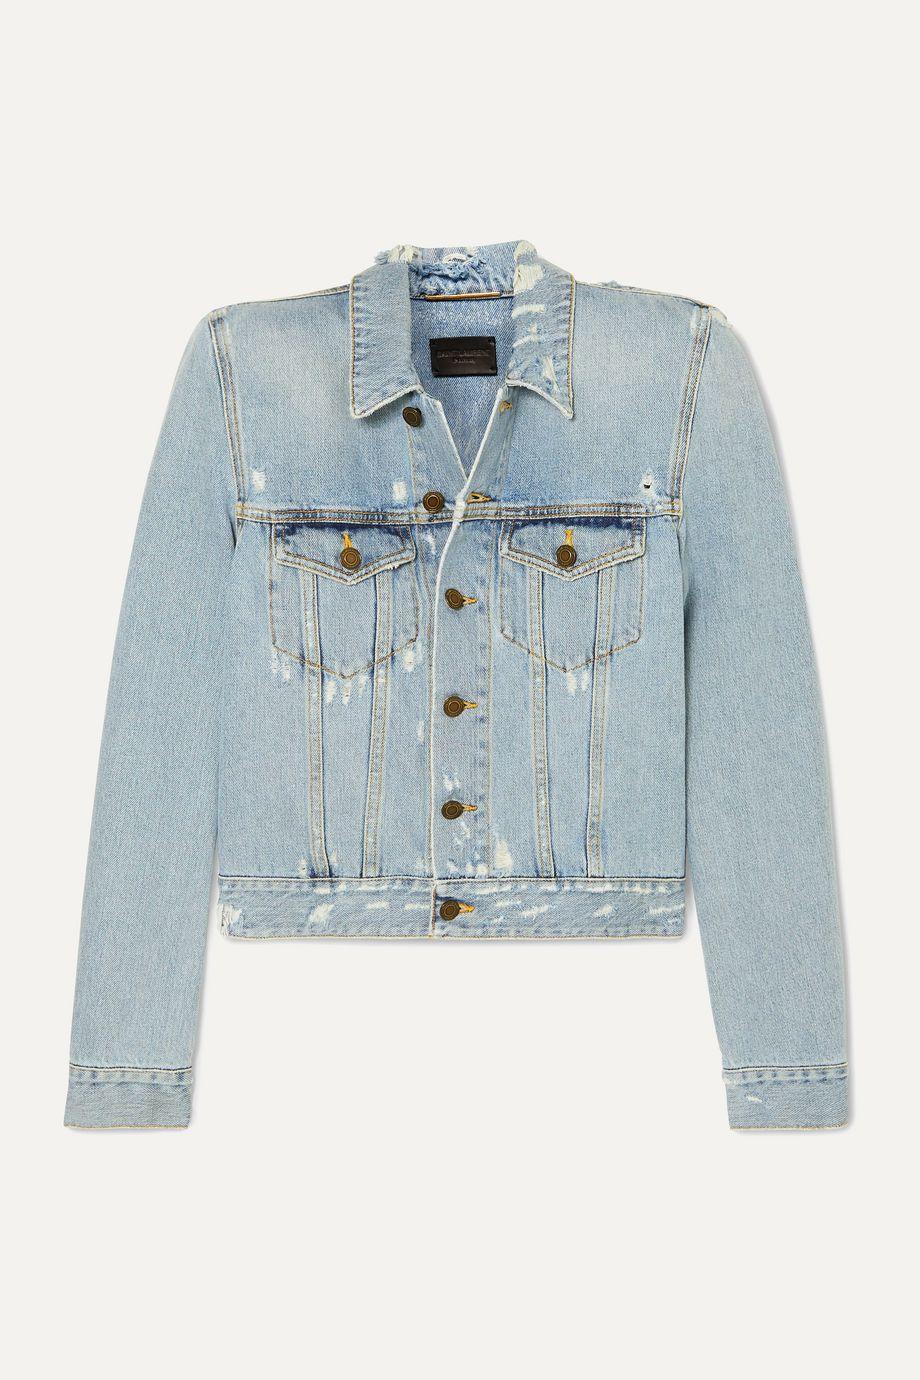 SAINT LAURENT Cropped distressed denim jacket